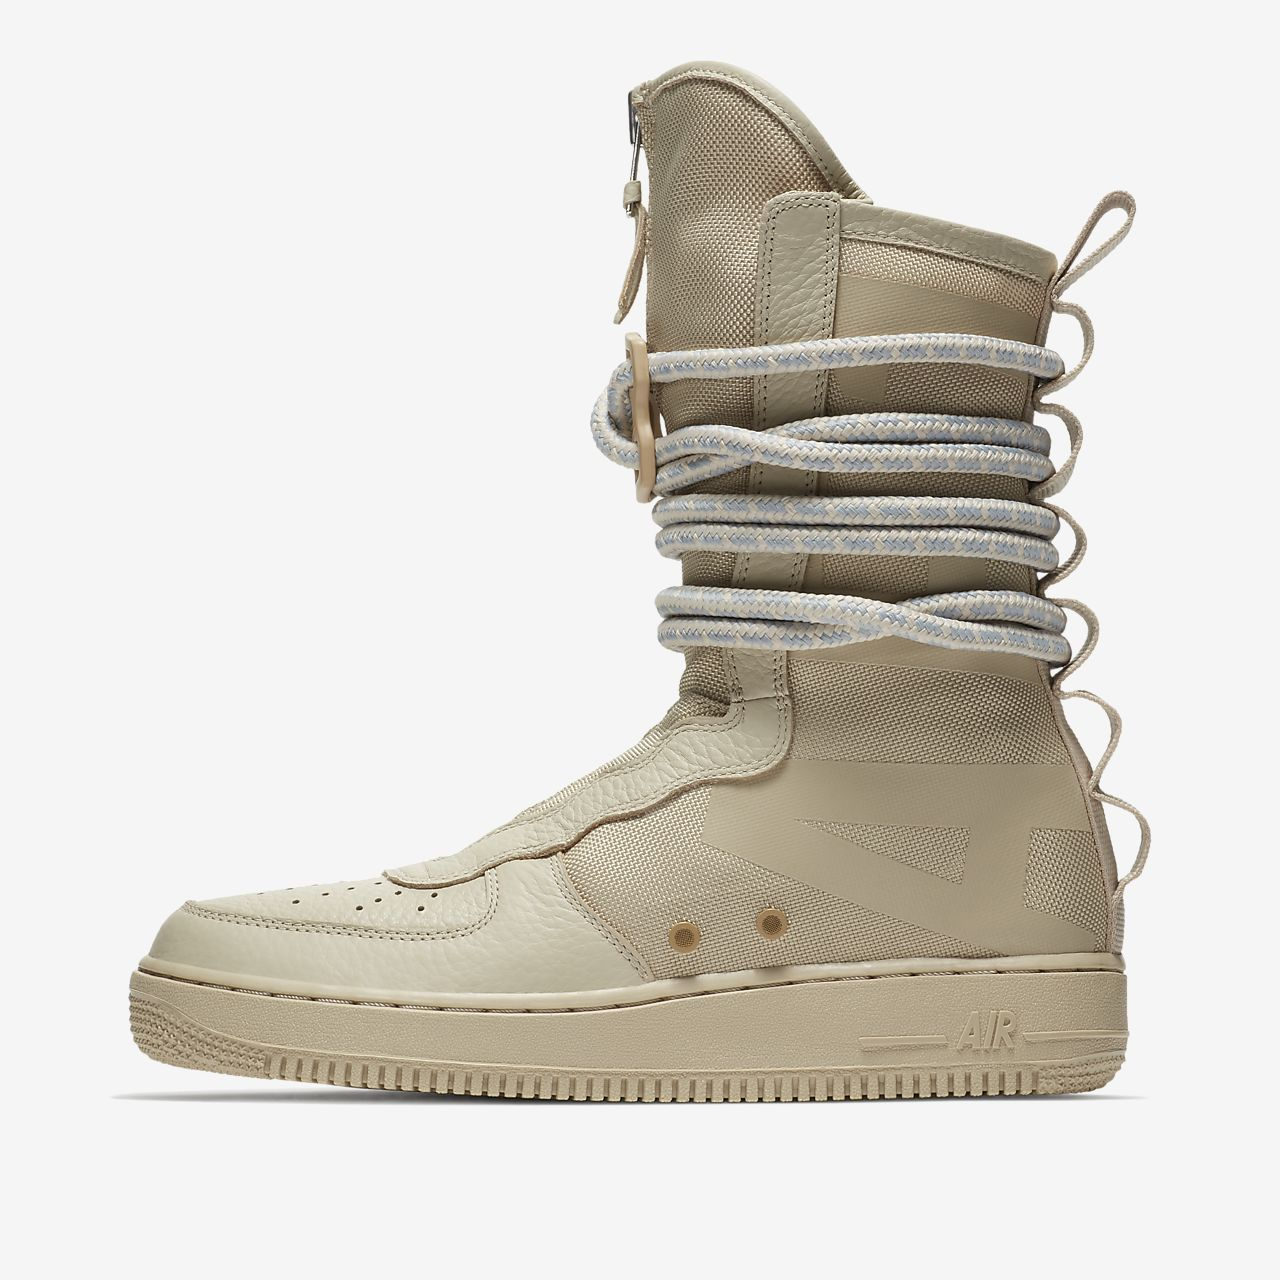 nike air force 1 sf